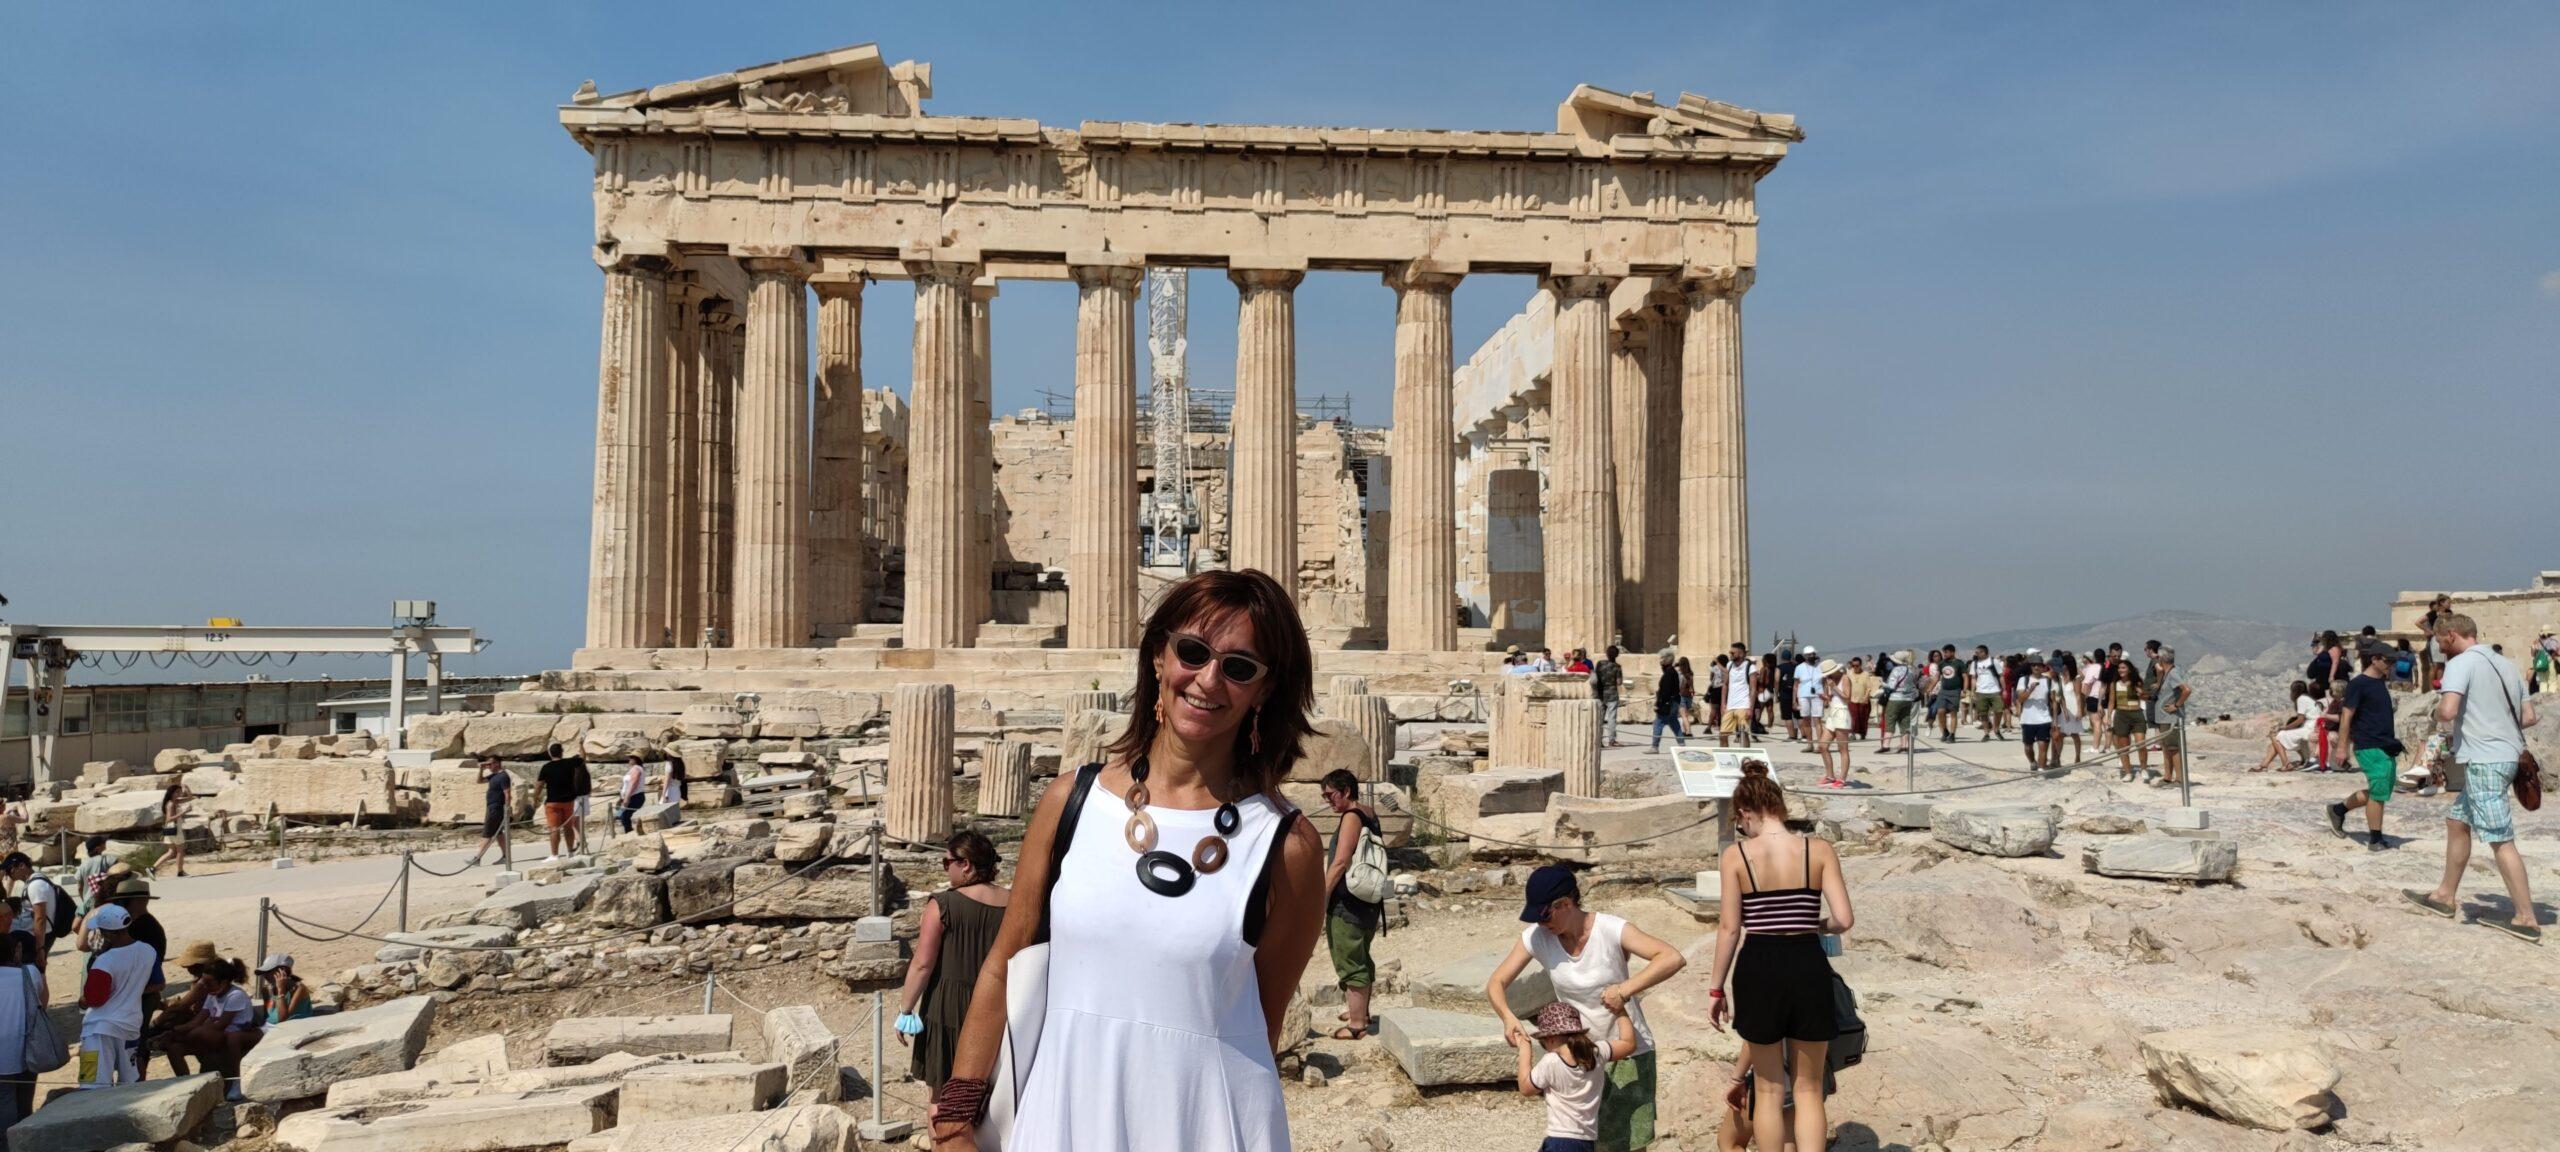 Mariantonietta consulente Evolution Travel in Grecia